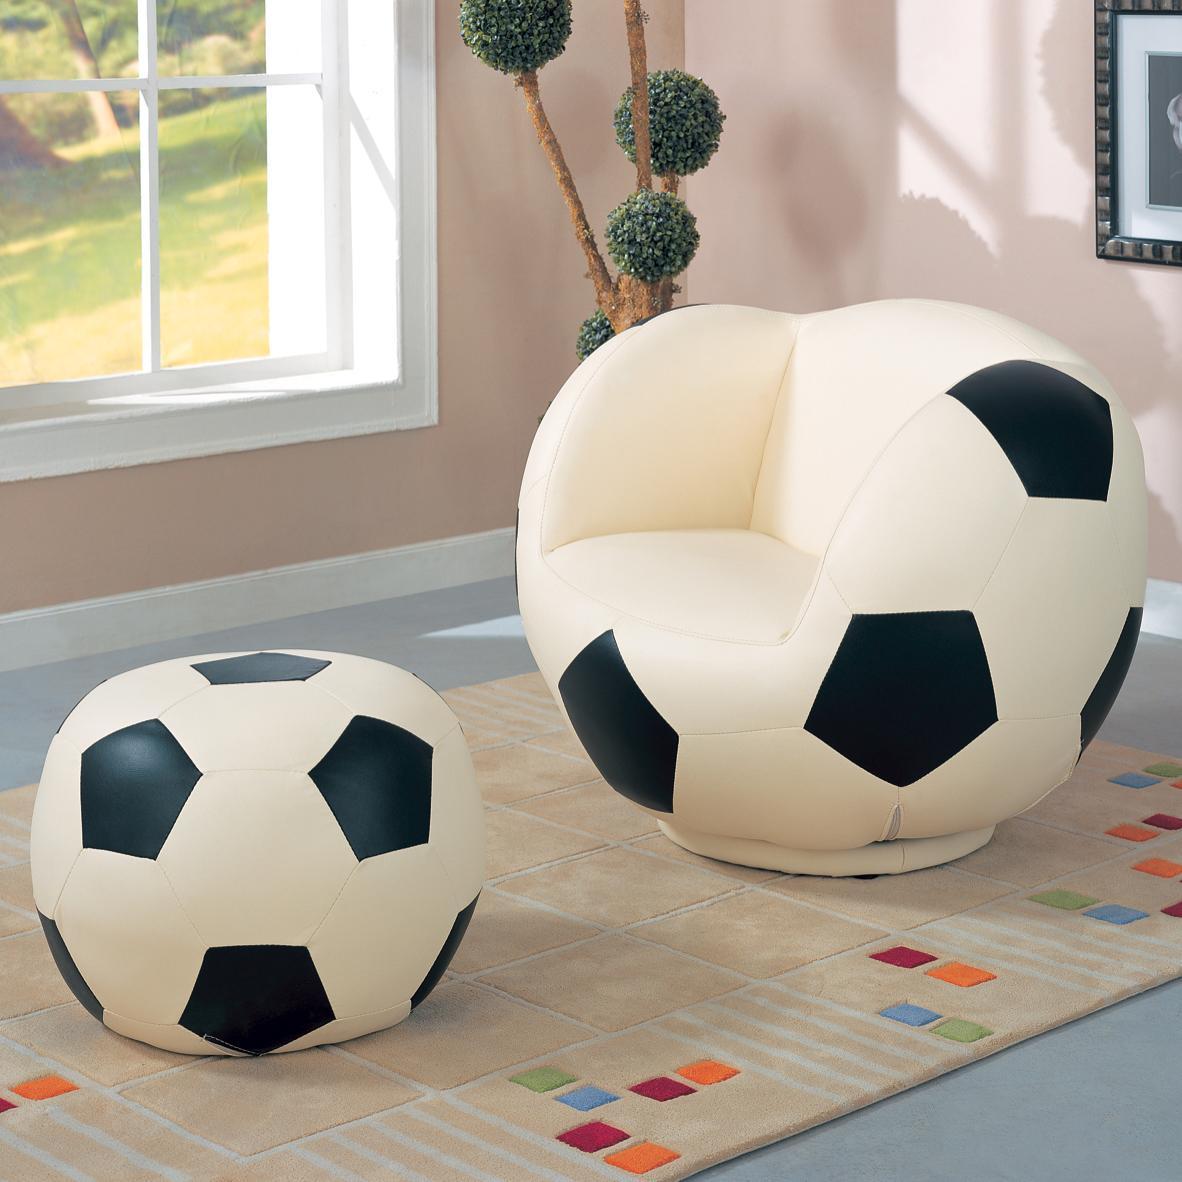 Kids_Sports_Chairs_460188-b